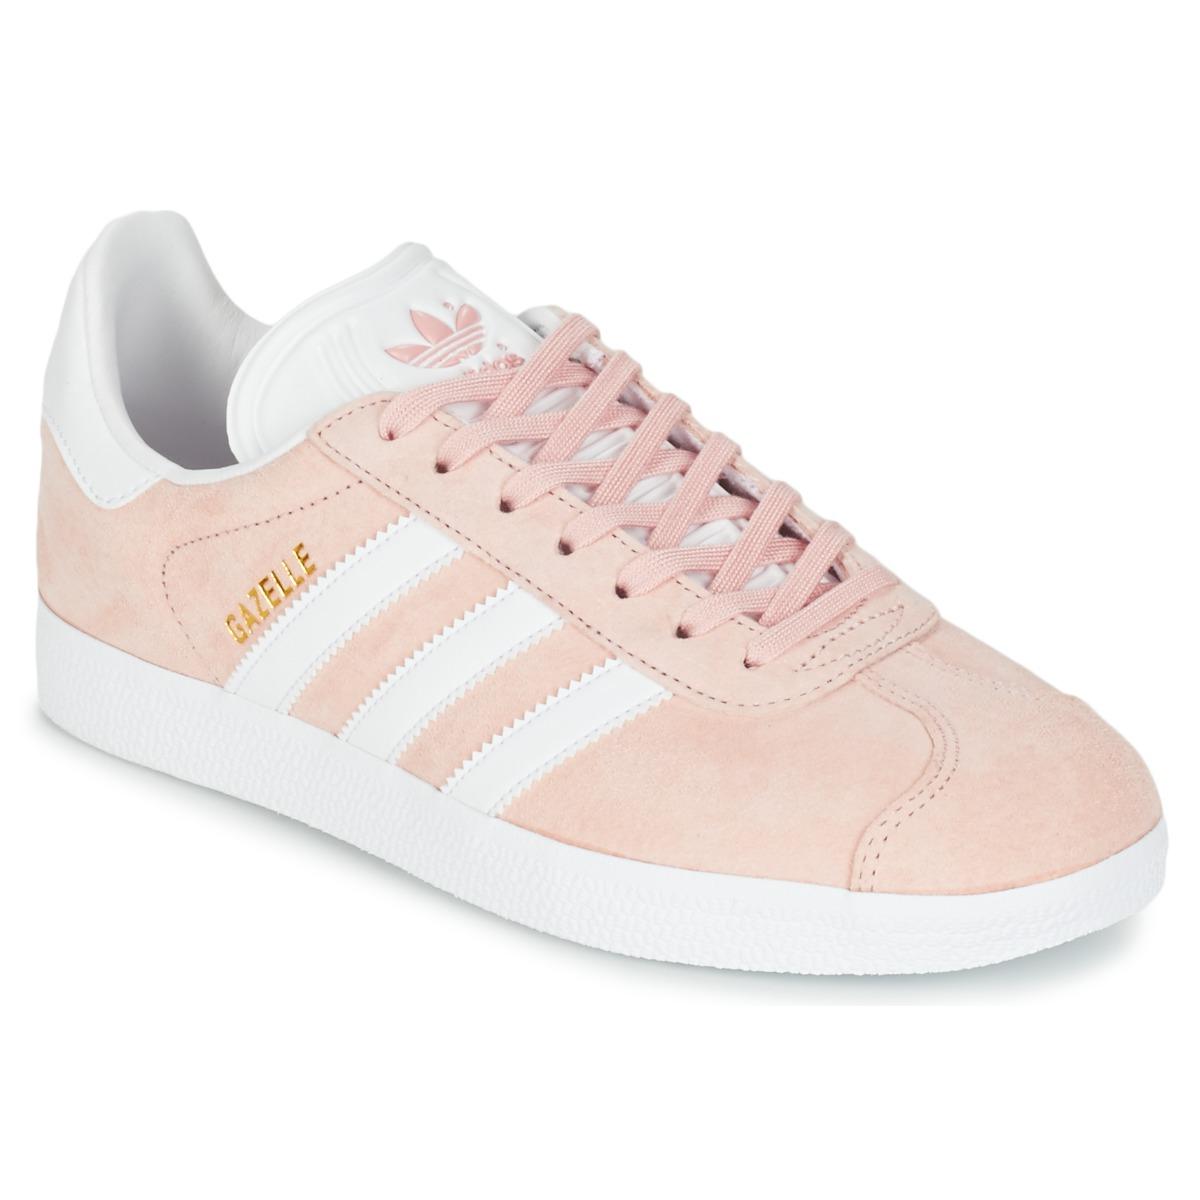 8b3287f8ef adidas Originals GAZELLE Rose - Chaussure pas cher avec Shoes.fr ! - Chaussures  Baskets basses Femme 88,99 €